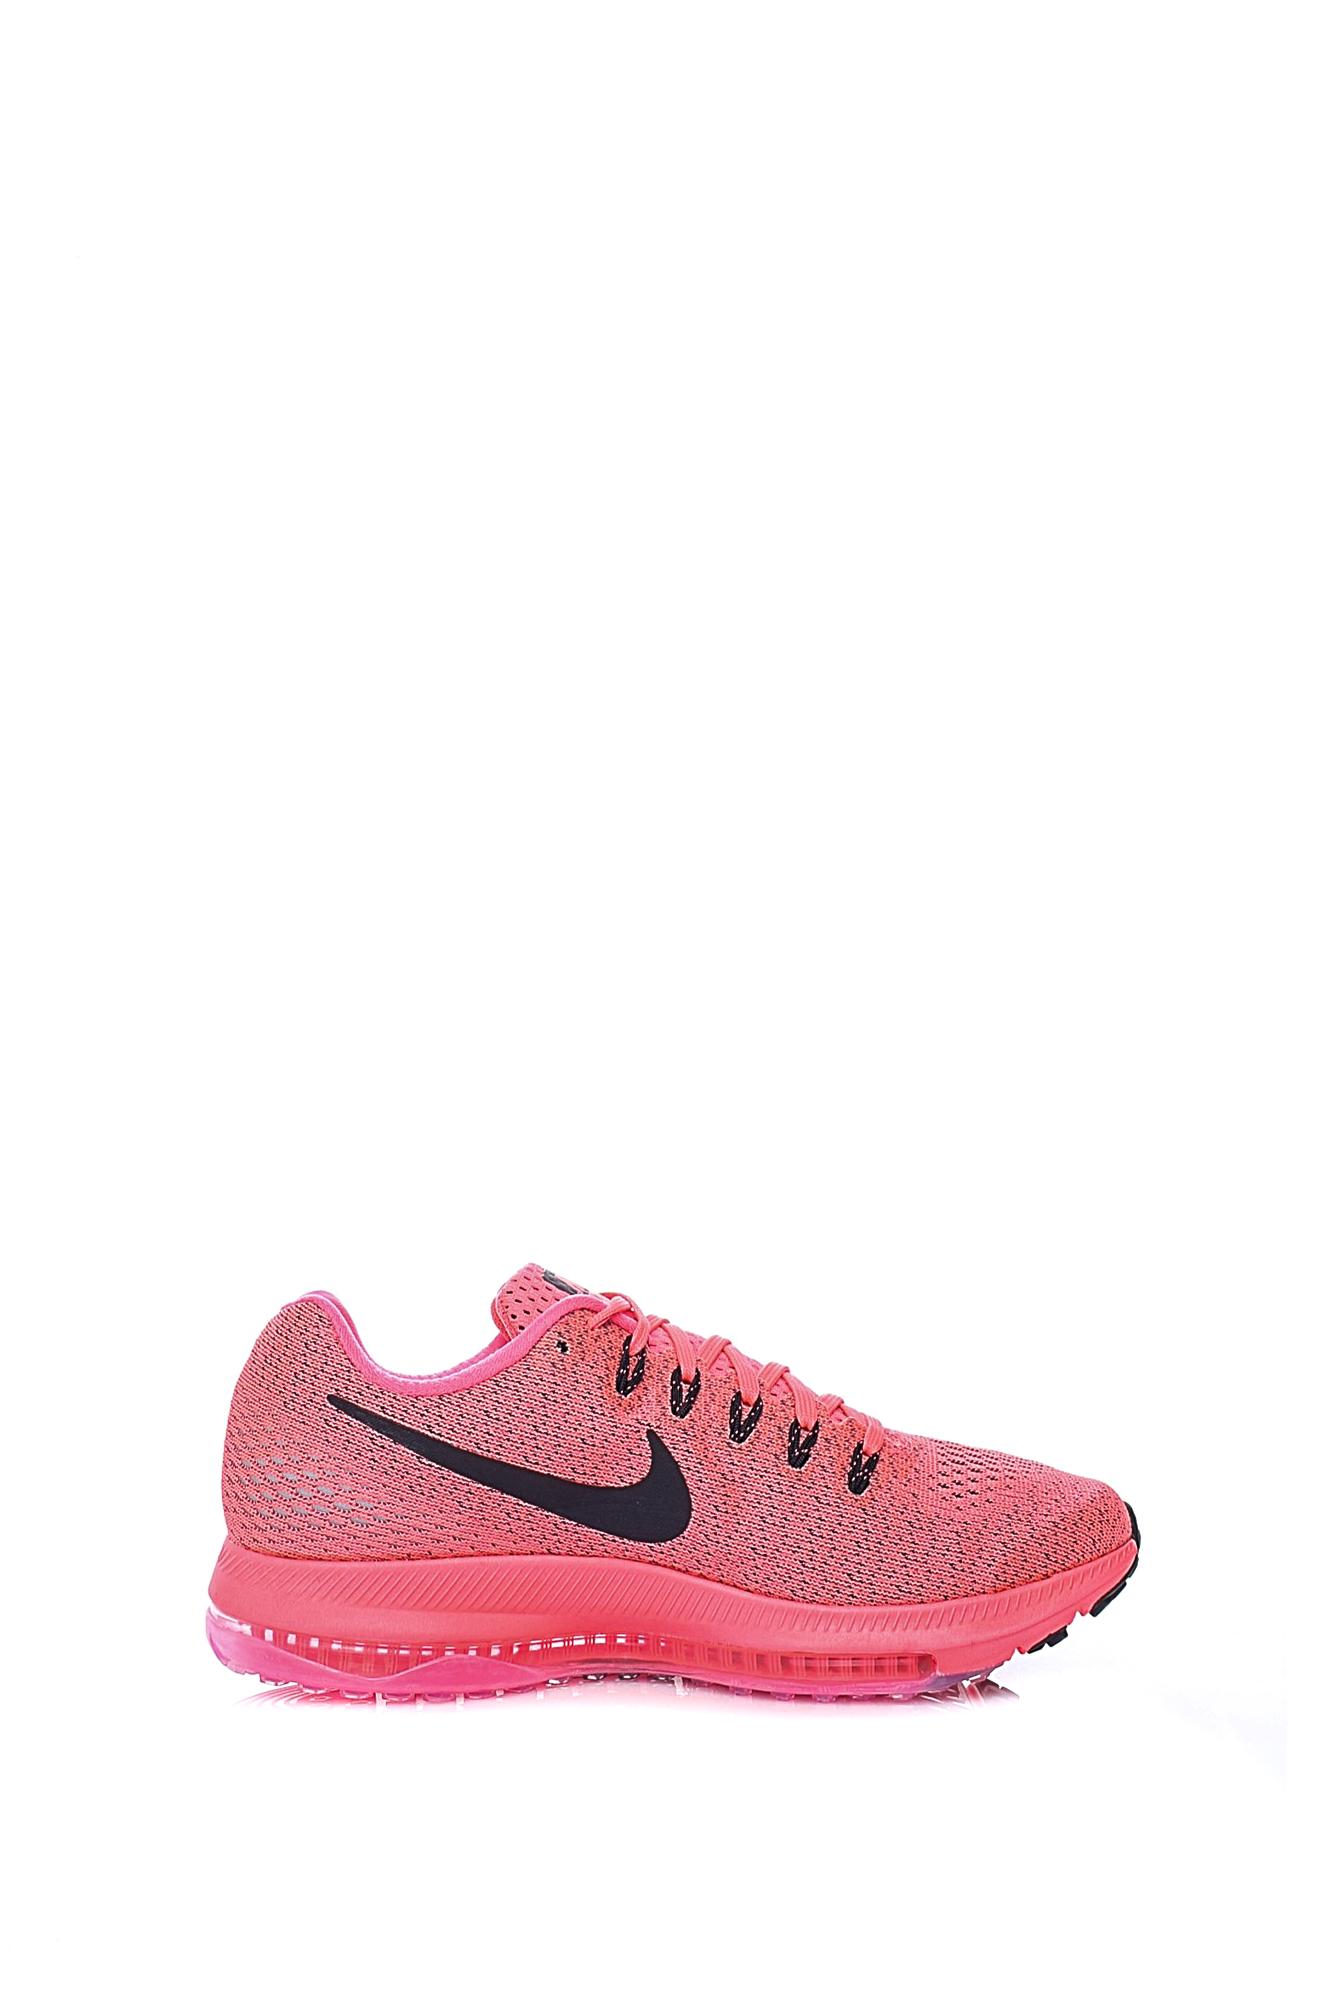 NIKE – Γυναικεία αθλητικά παπούτσια Nike ZOOM ALL OUT LOW φούξια